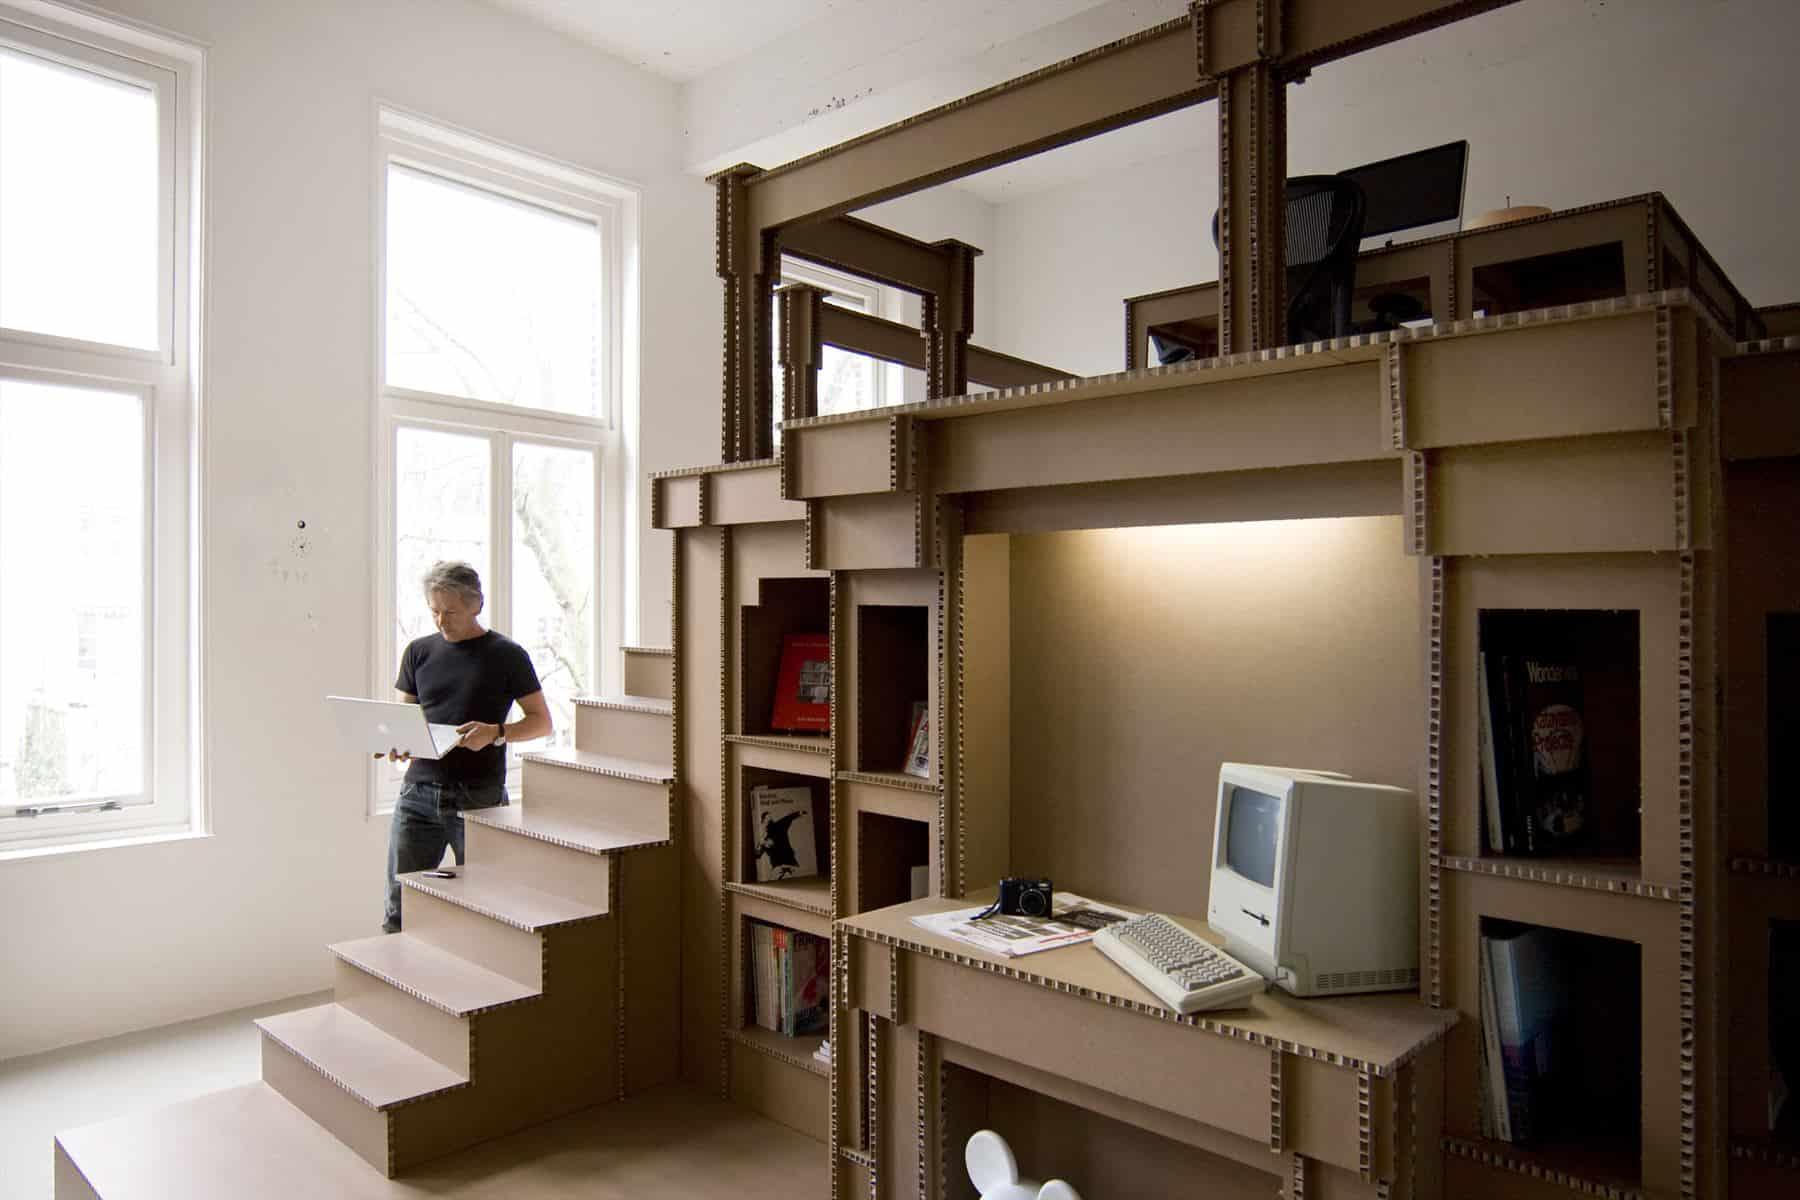 Nothing Cardboard Office Interior By Alrik Koudenburg And